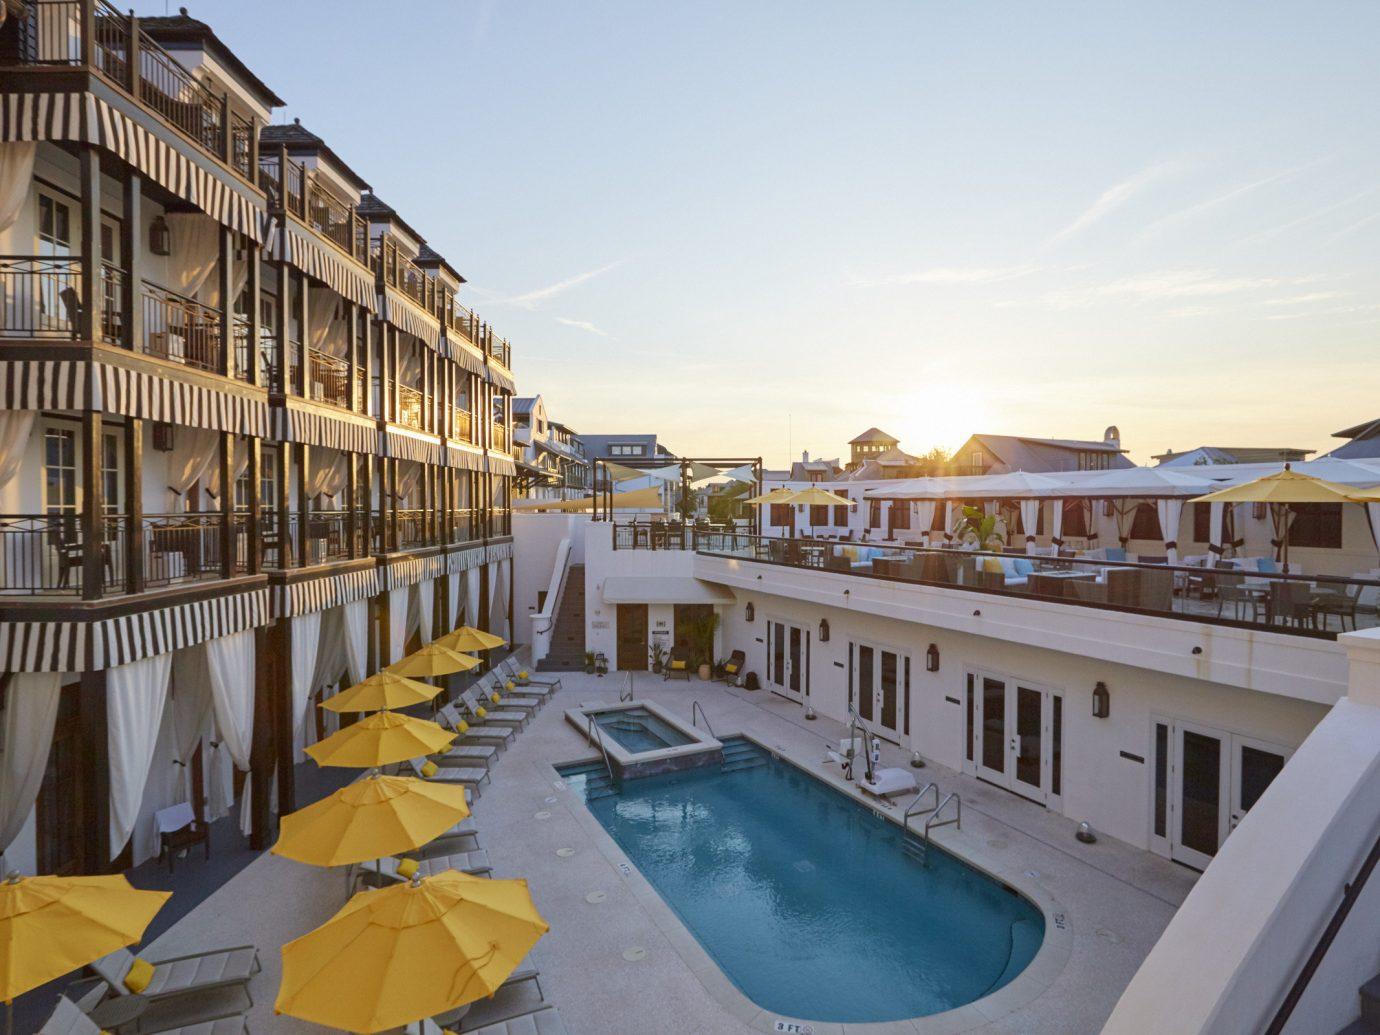 Beach sky outdoor property Resort marina vacation dock estate palace vehicle apartment Deck